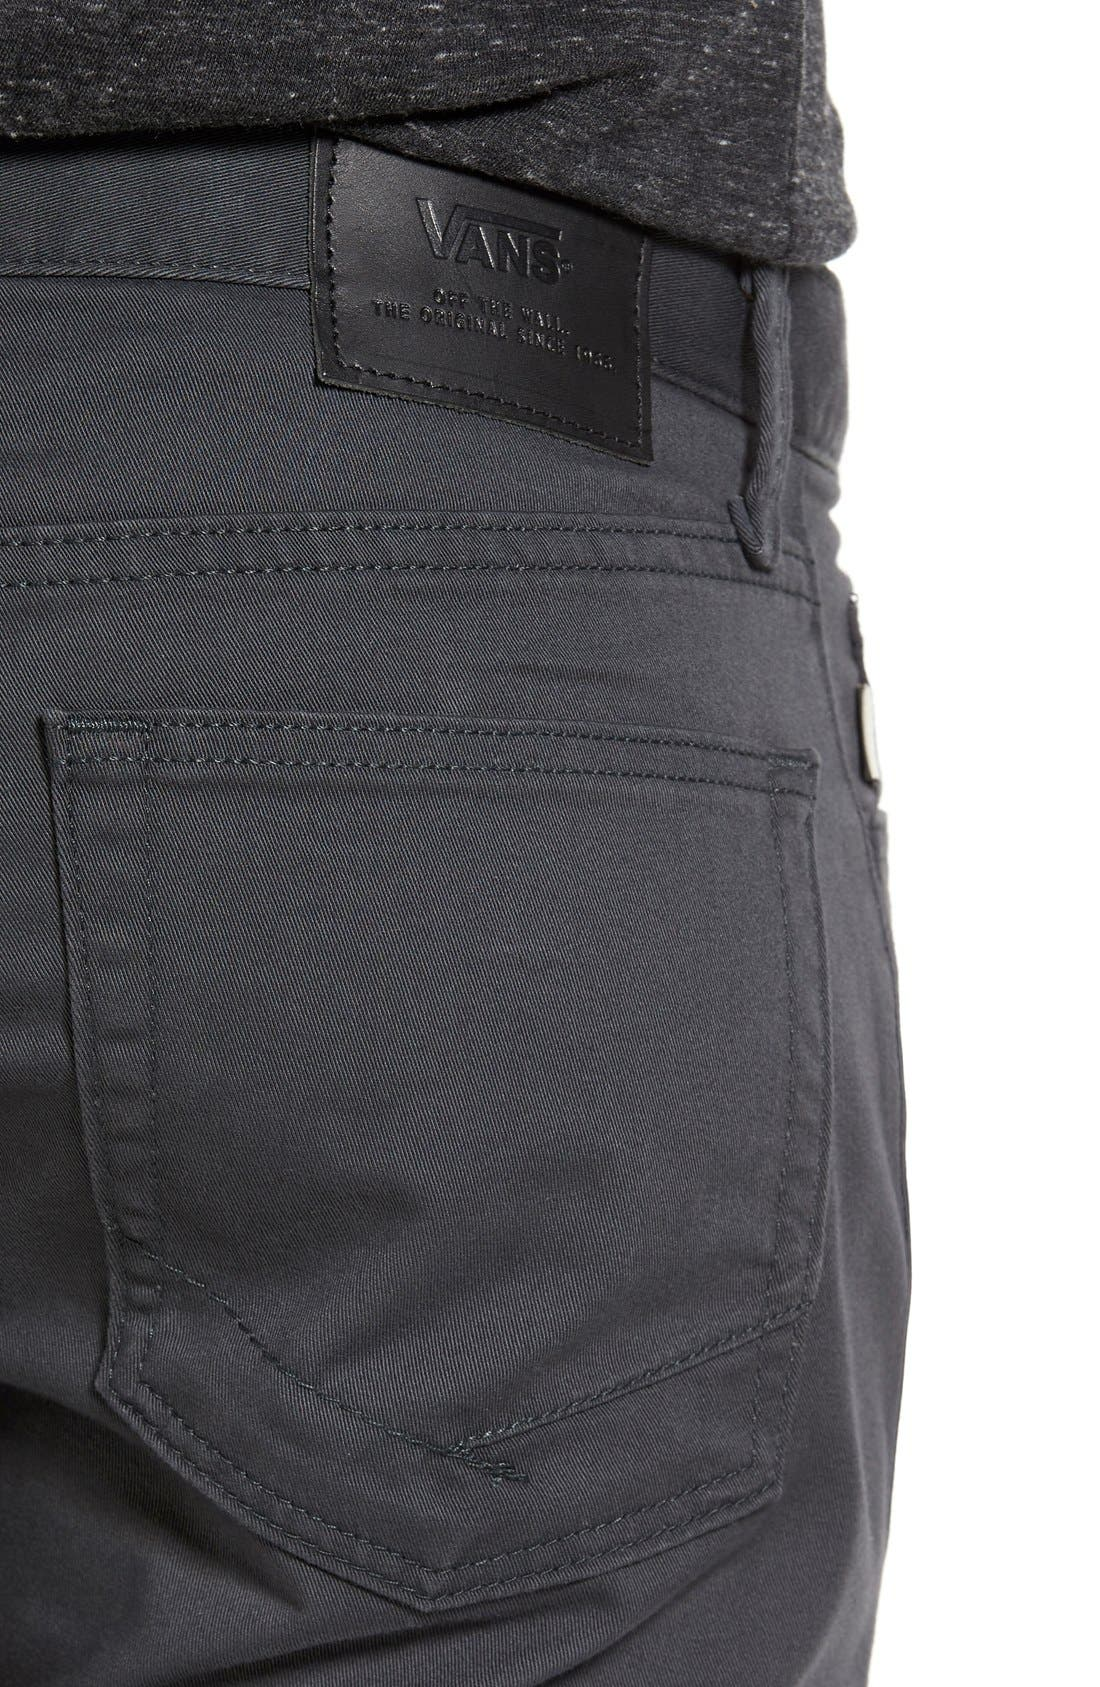 V56 Covina II Slim Fit Pants,                             Alternate thumbnail 20, color,